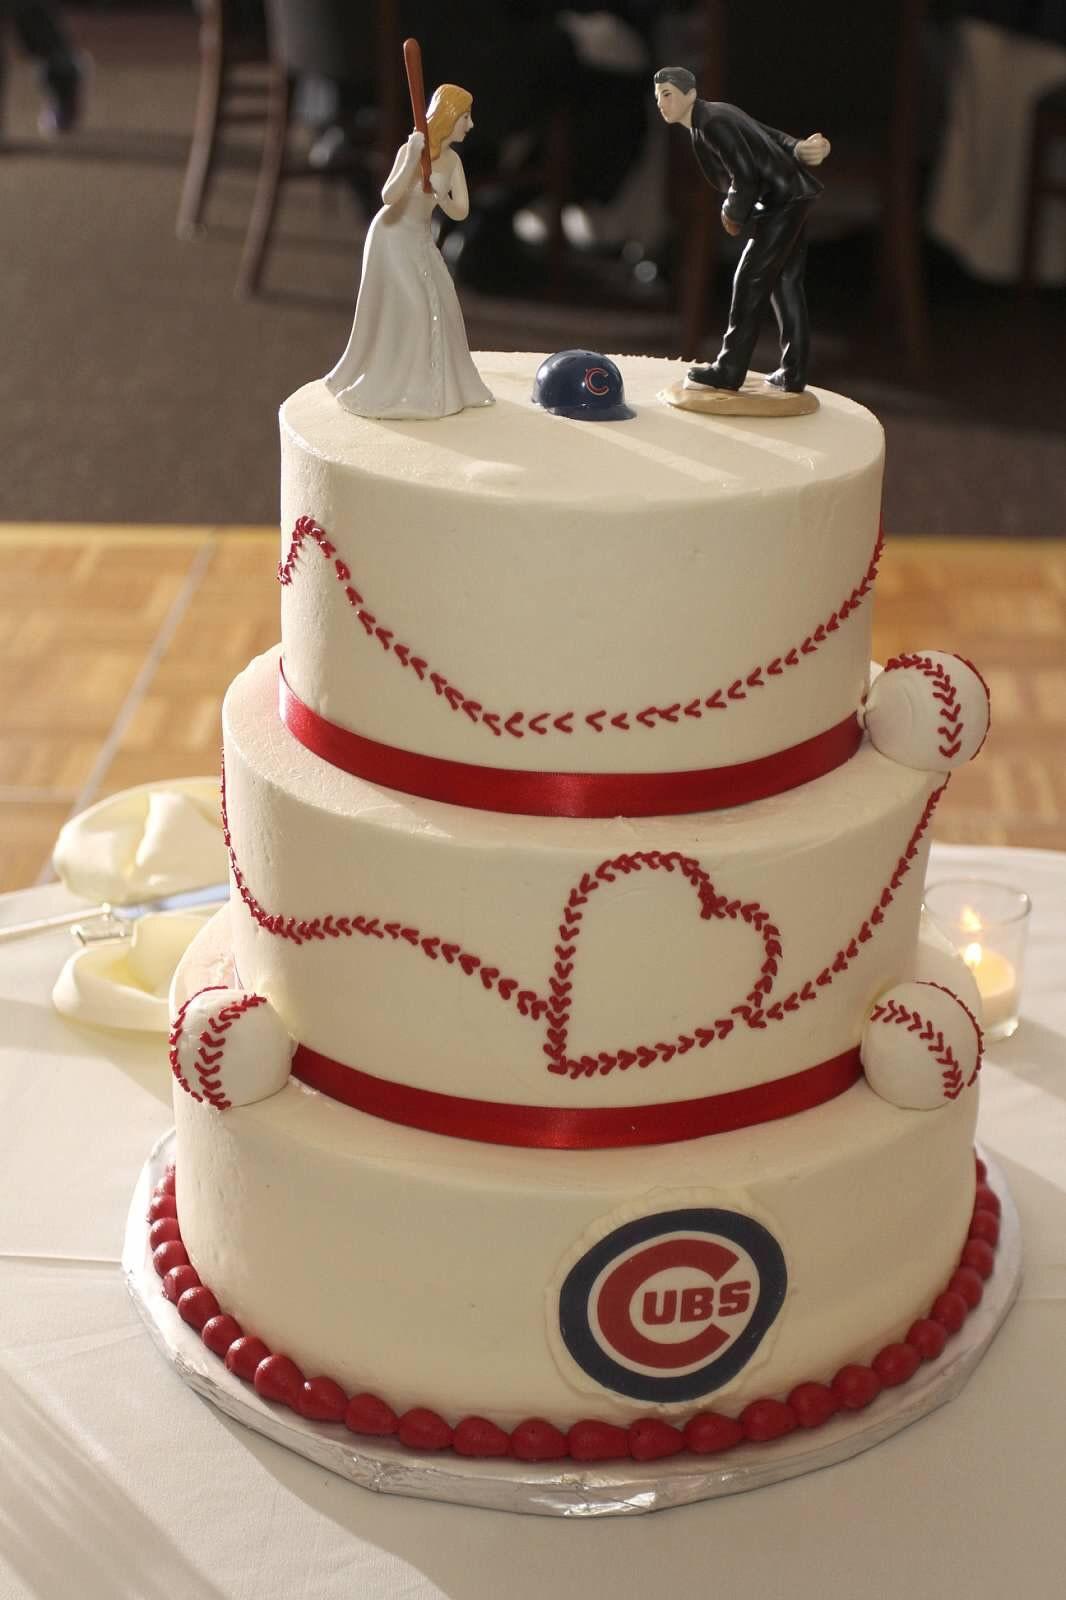 Wedding Cakes Chicago  Chicago Cubs Baseball Wedding Cake